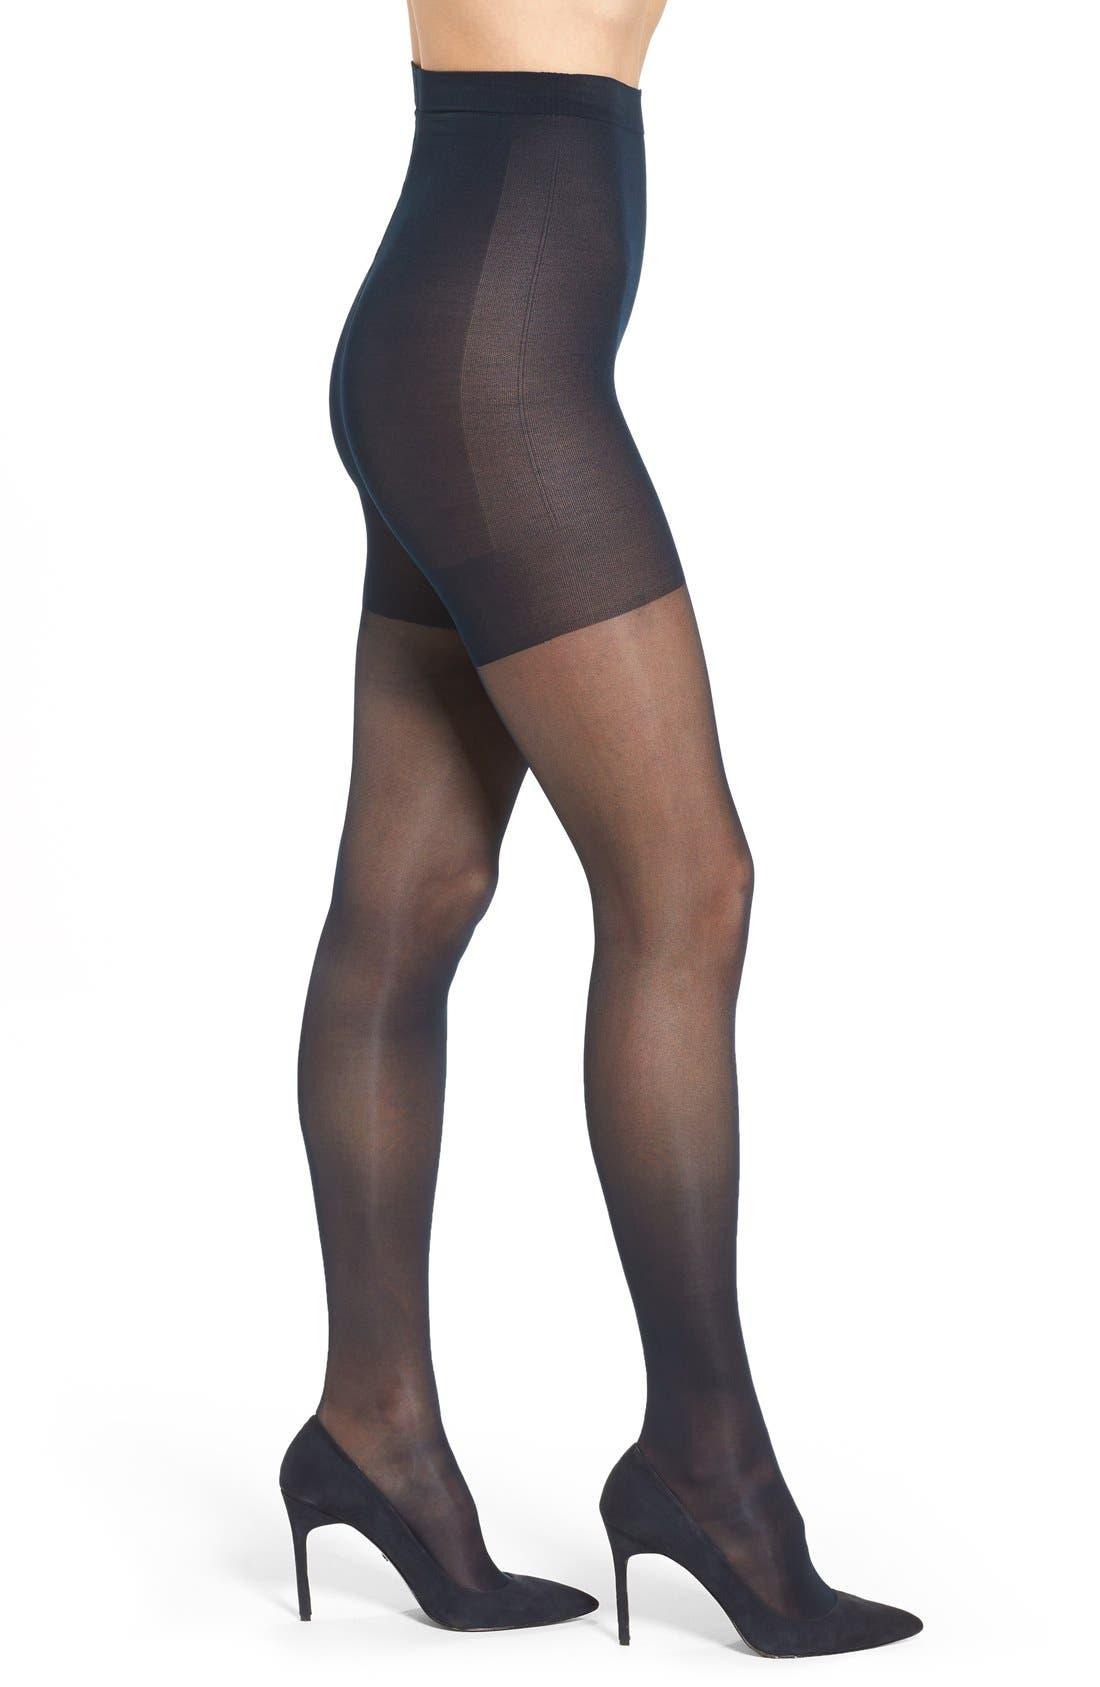 11df42c55bbff Buy insignia by sigvaris socks, leggings & hosiery for women - Best women's  insignia by sigvaris socks, leggings & hosiery shop - Cools.com